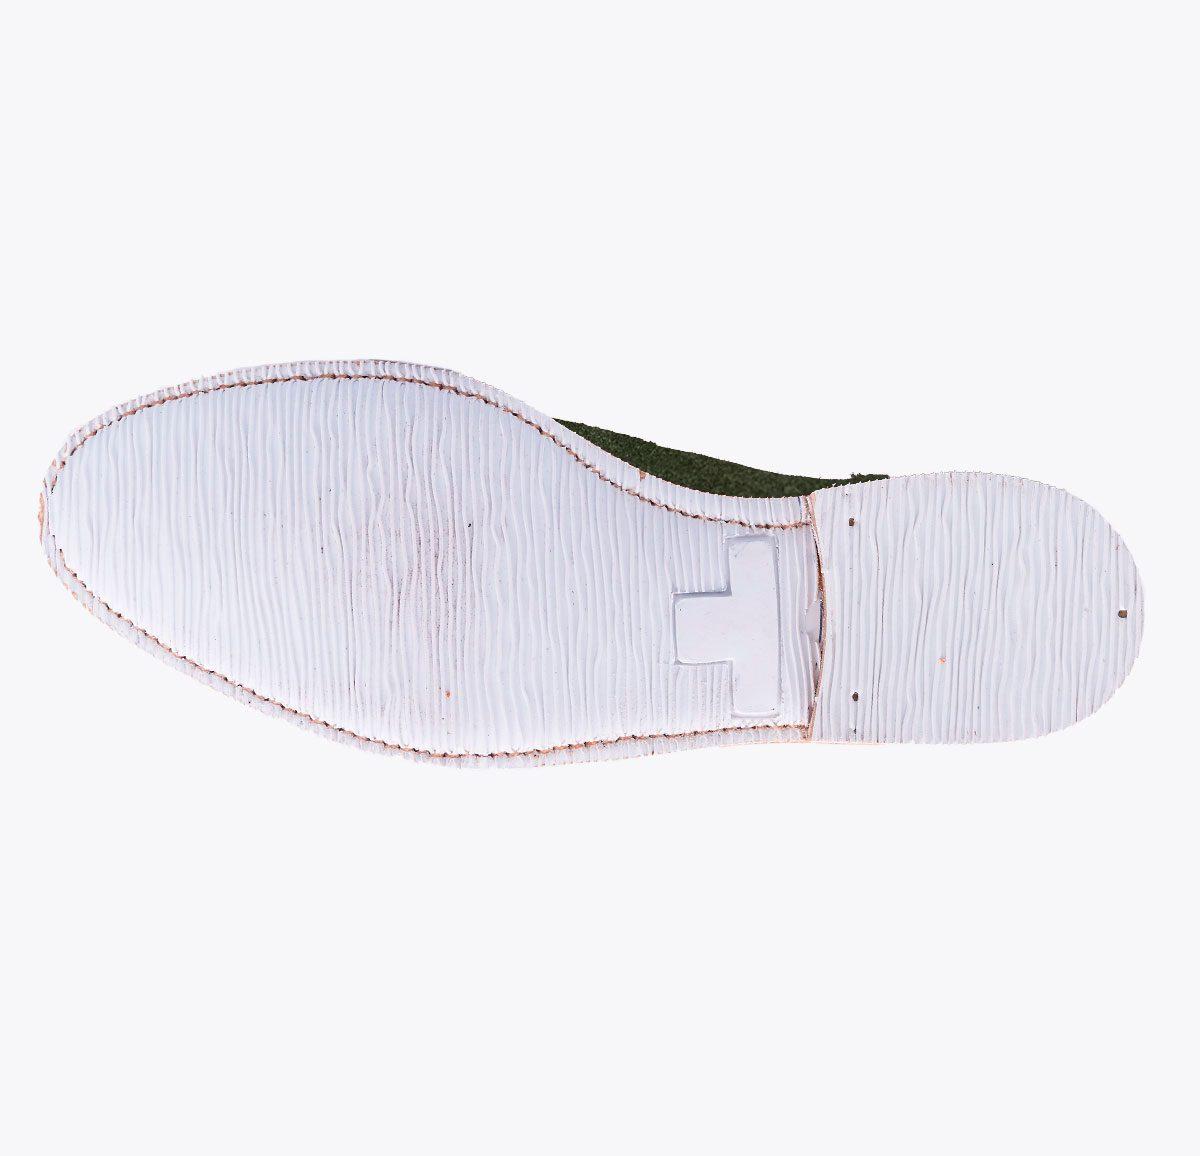 Zapato Summer 1 musgo hecho a mano en mandalashoes, Santanyí Mallorca. Hand made shoes. Nach Mass Schuhe